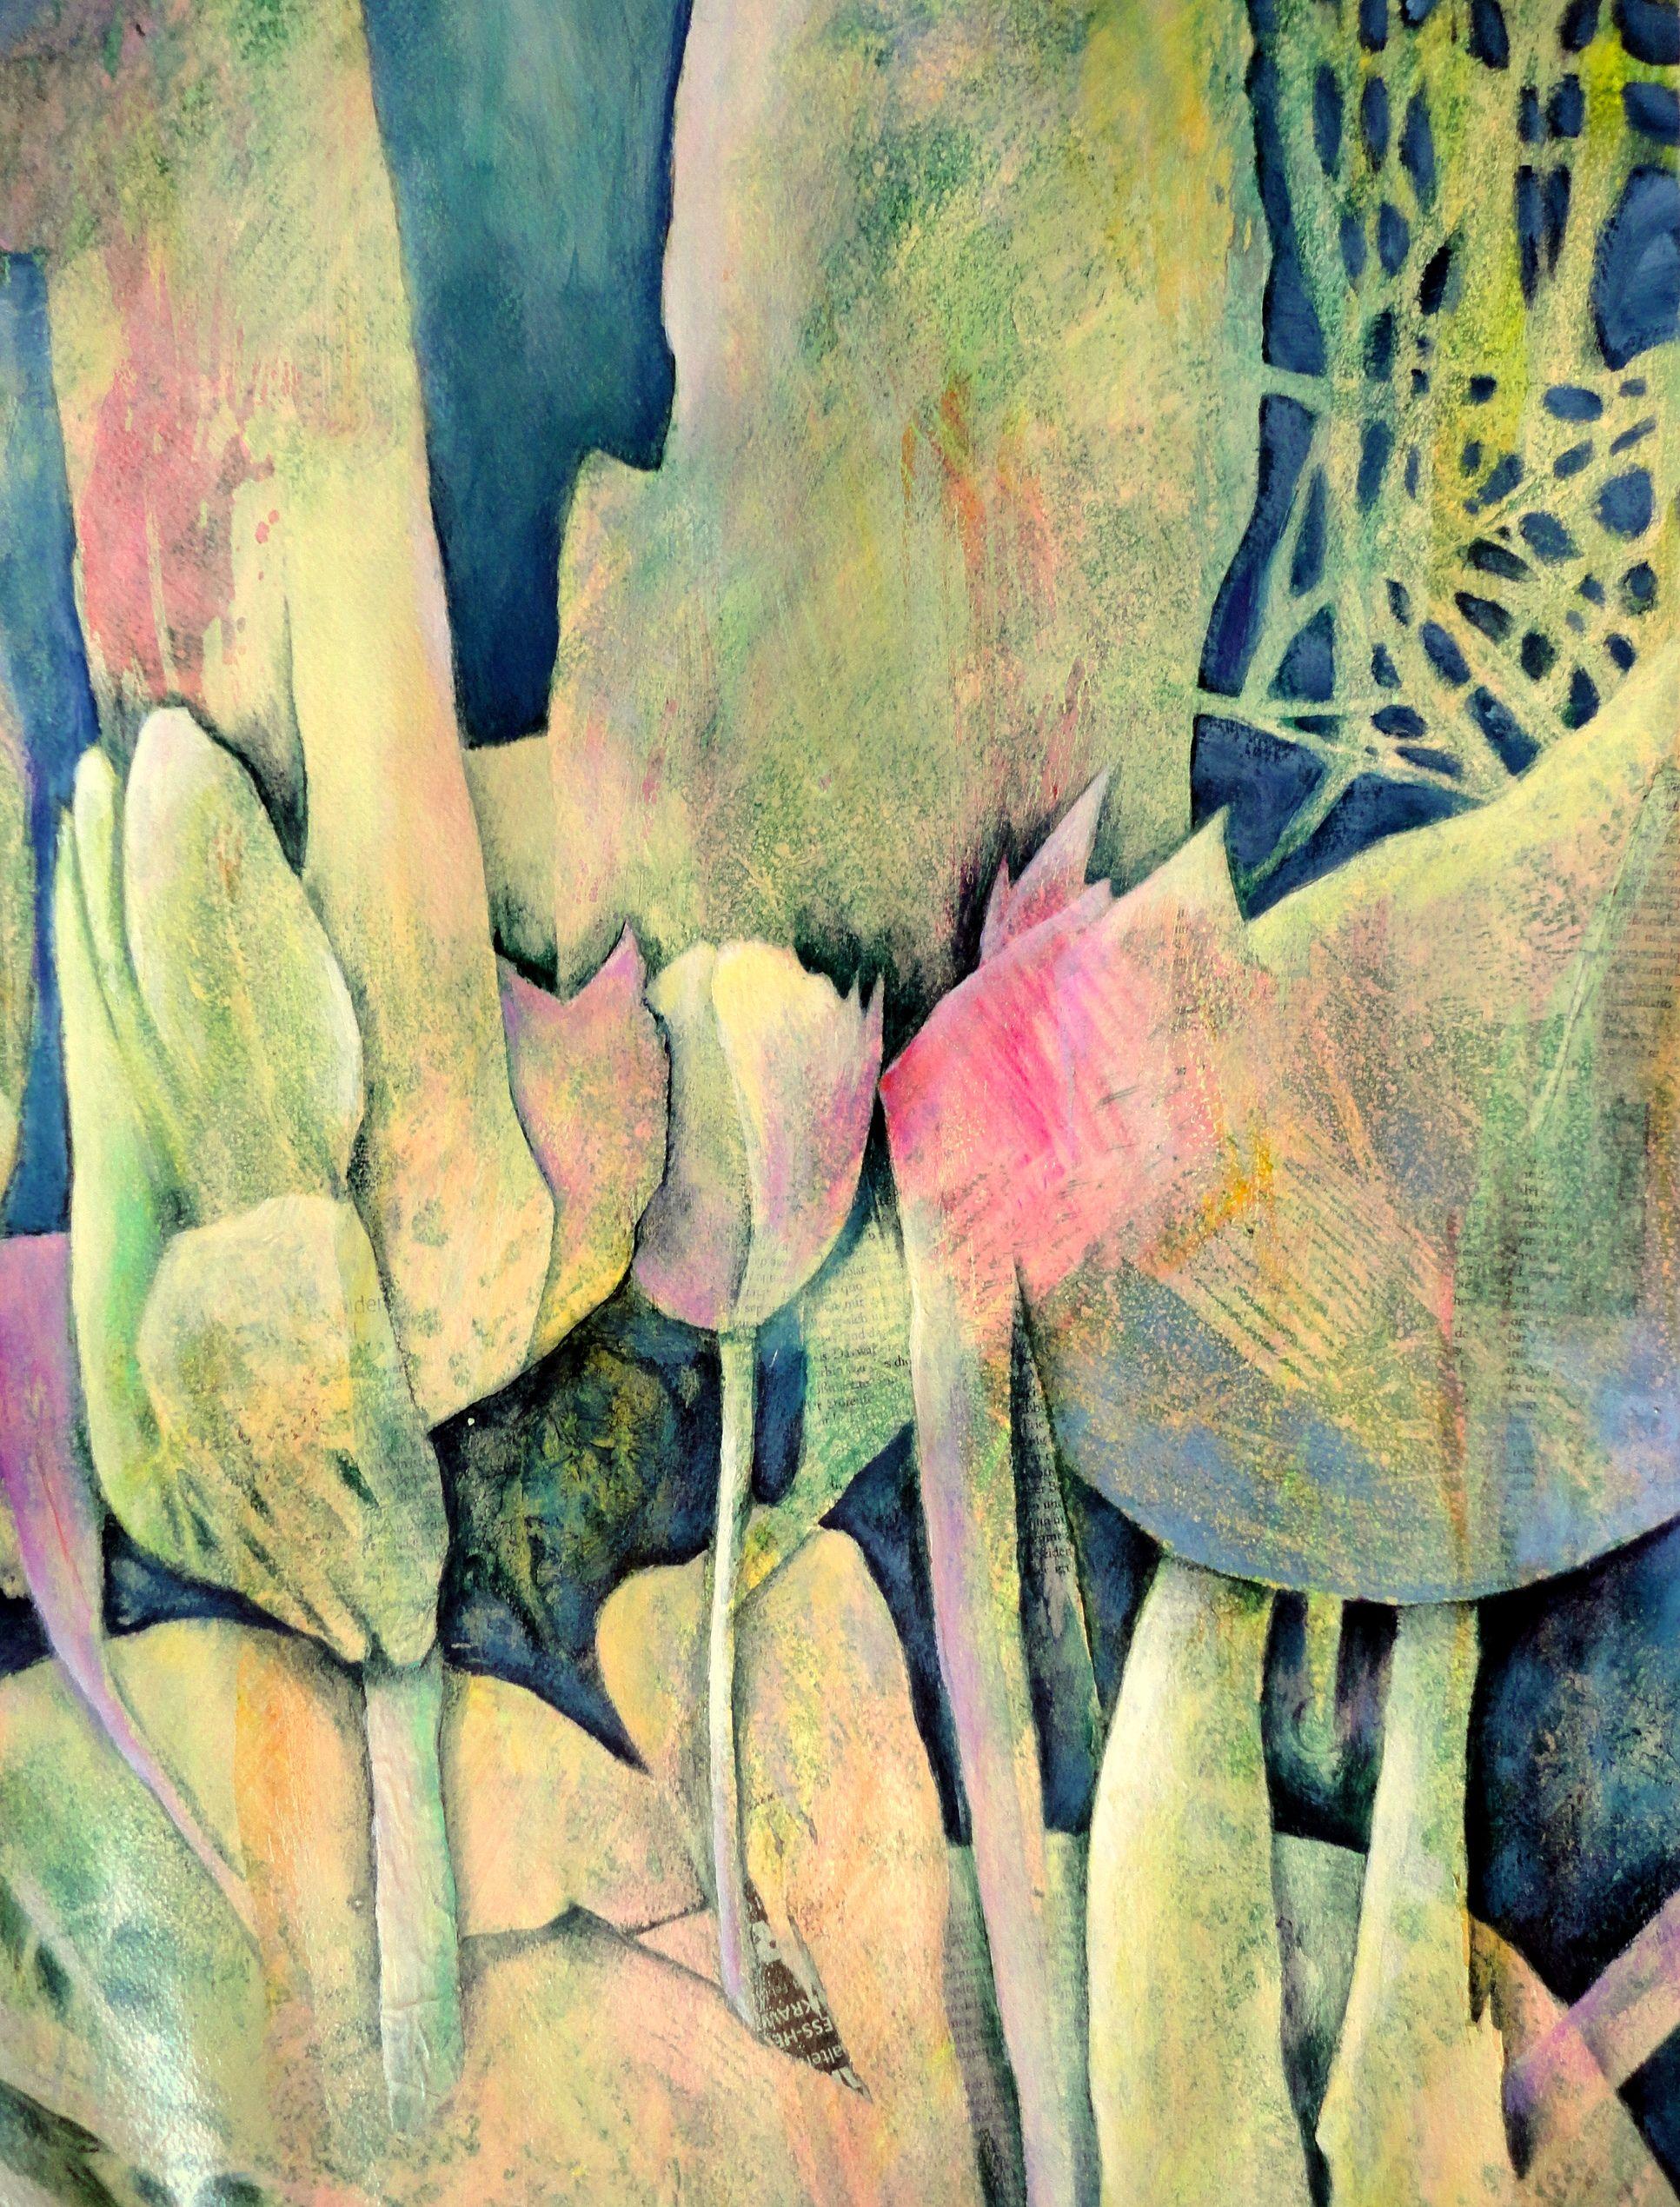 Acrylmalerei Kleine Lockerungsubung Acrylic Painting Loosening Up